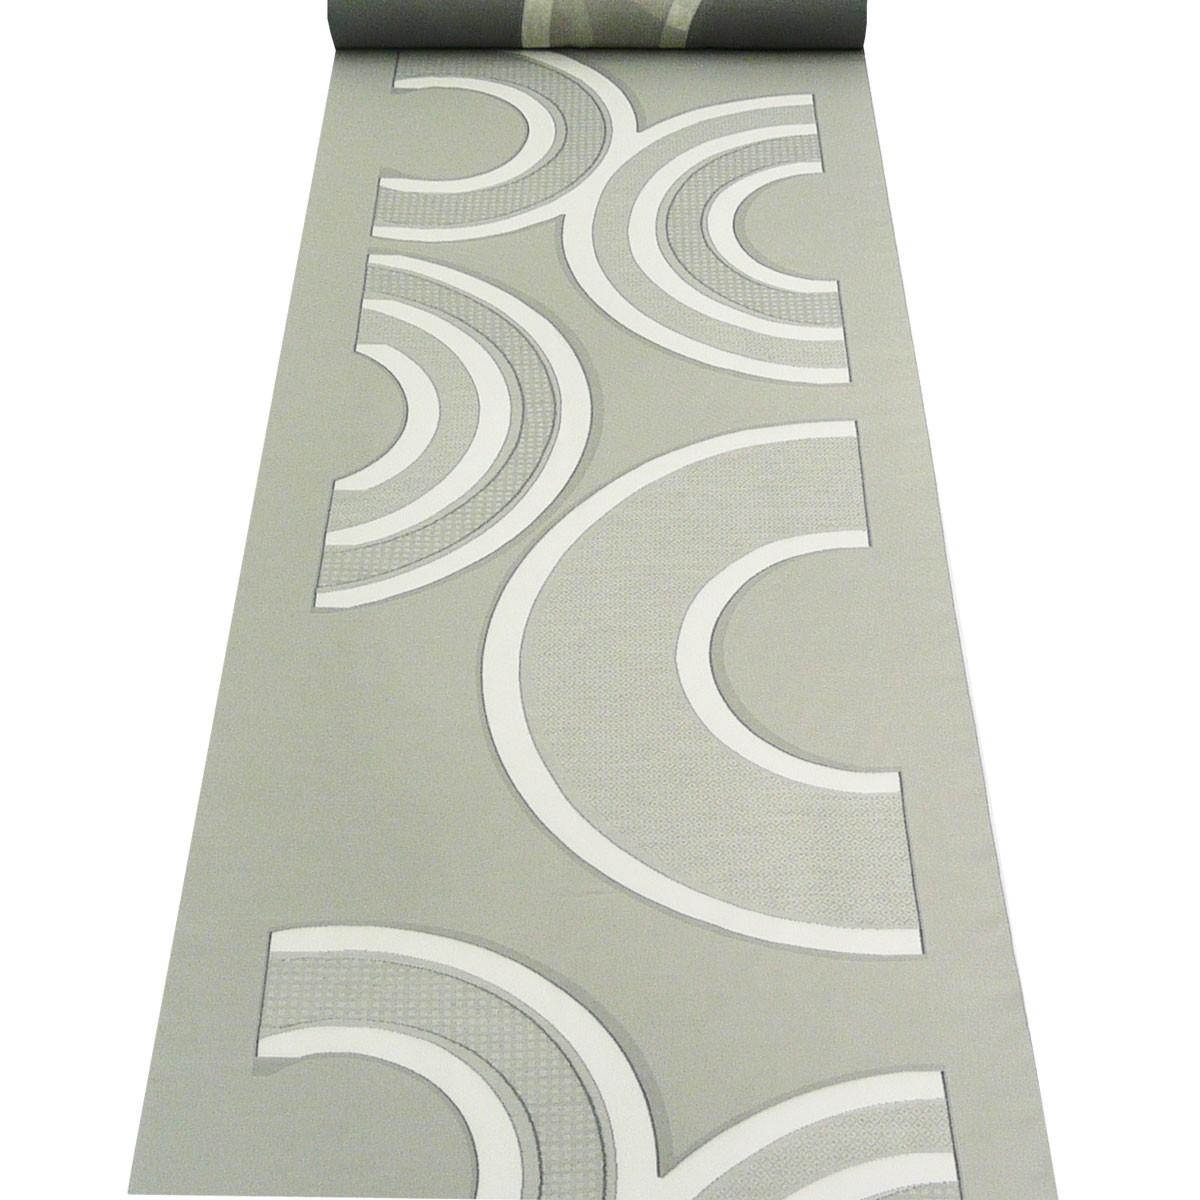 gardinenstoff paneele meterware solar halbkreis muster grau 60cm breite stoffe wohnstoffe. Black Bedroom Furniture Sets. Home Design Ideas